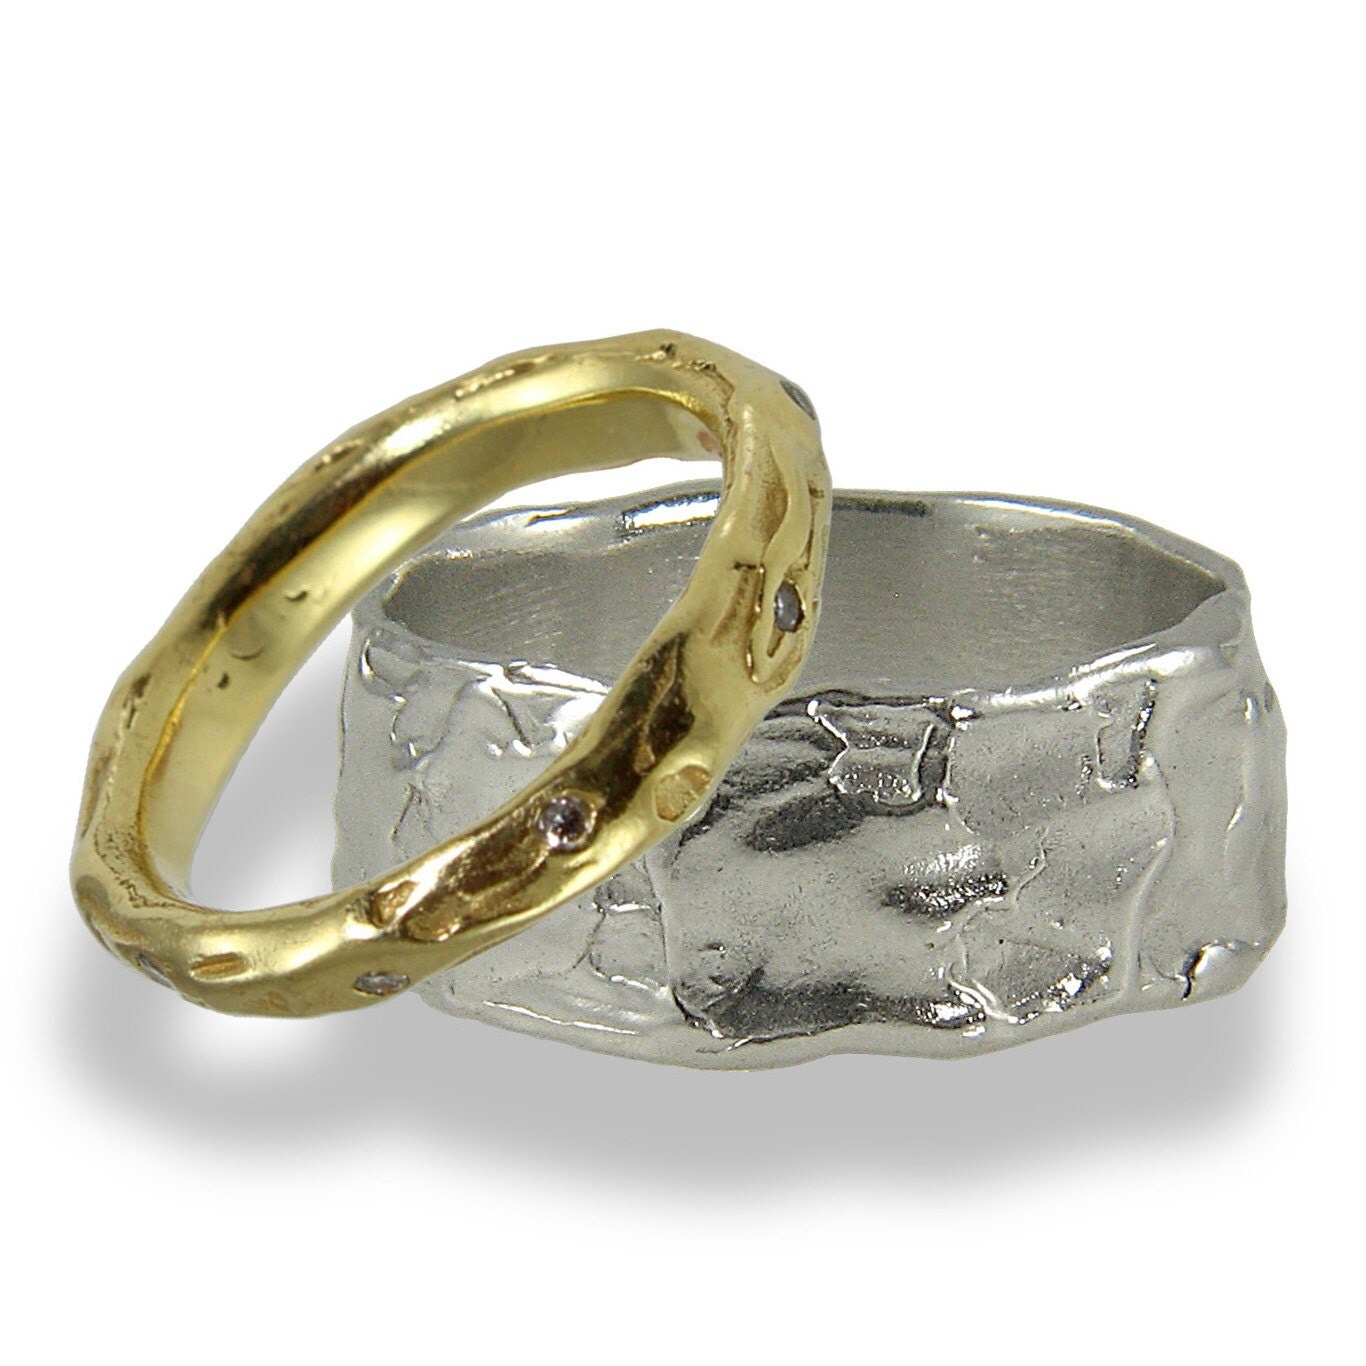 Zales Mens Wedding Rings 007 - Zales Mens Wedding Rings